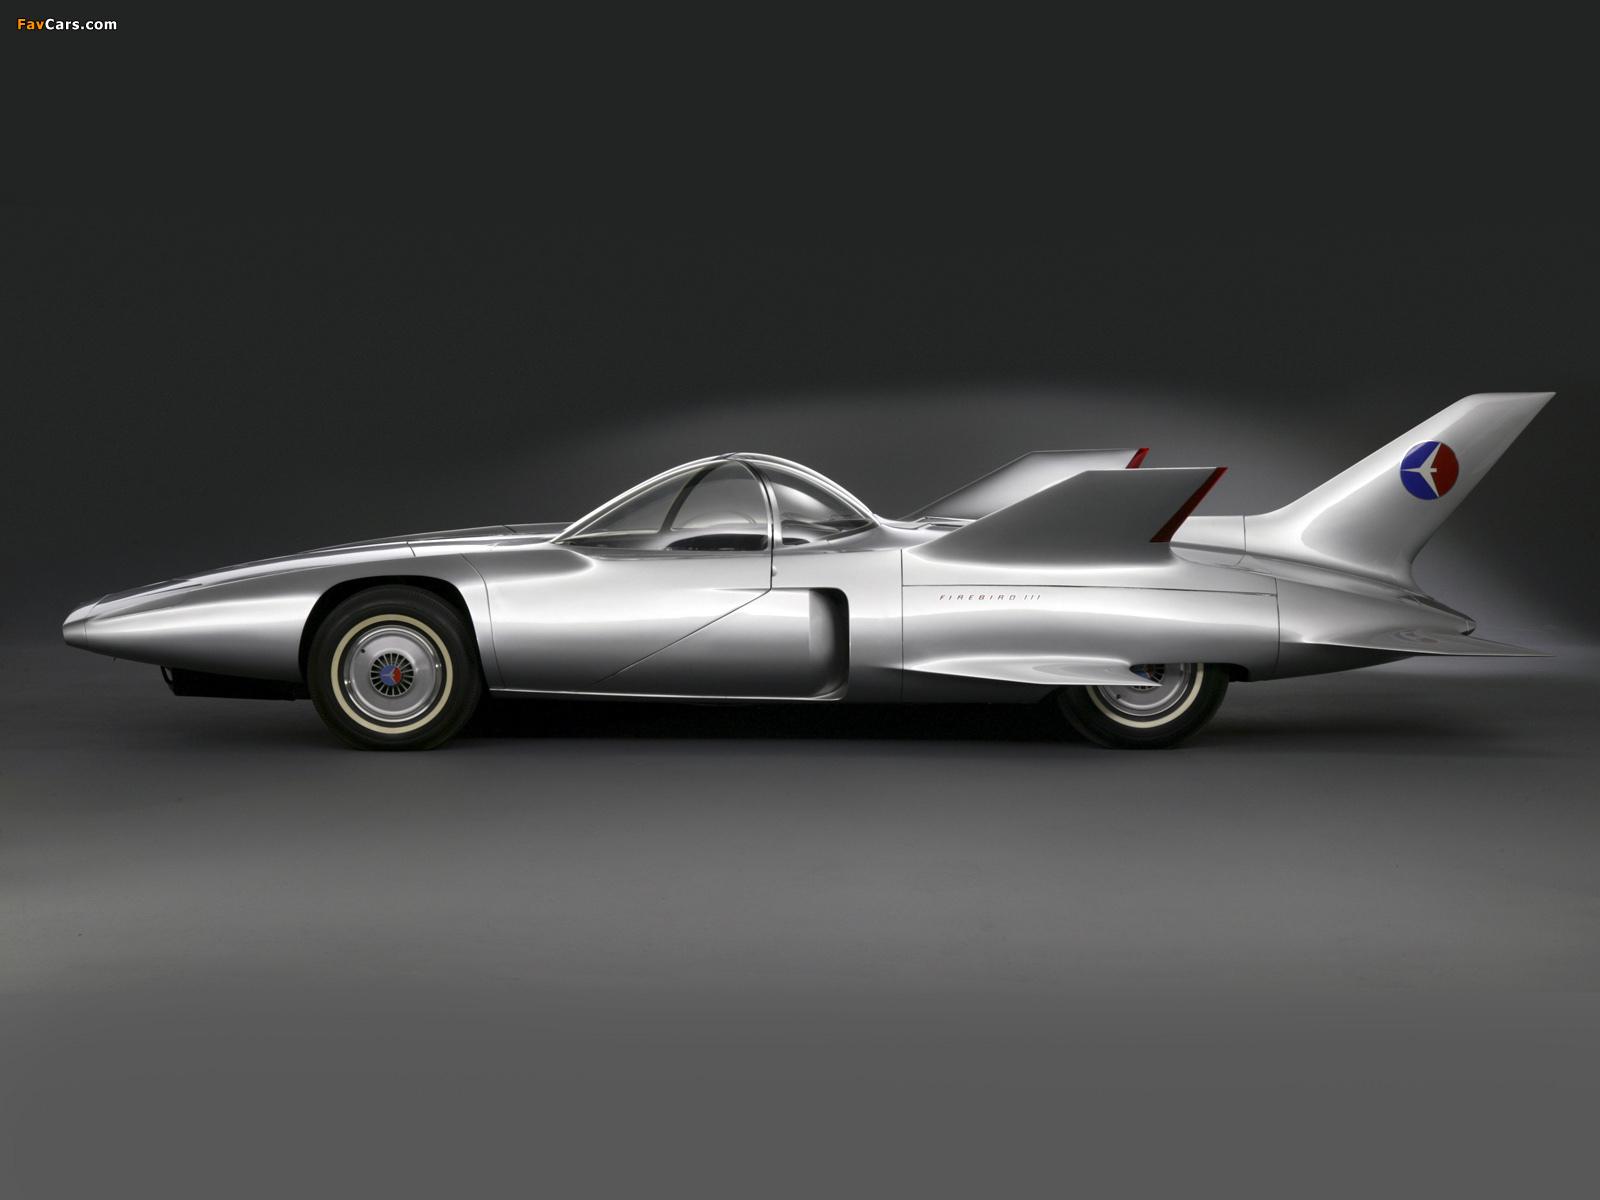 images of gm firebird iii concept car 1958